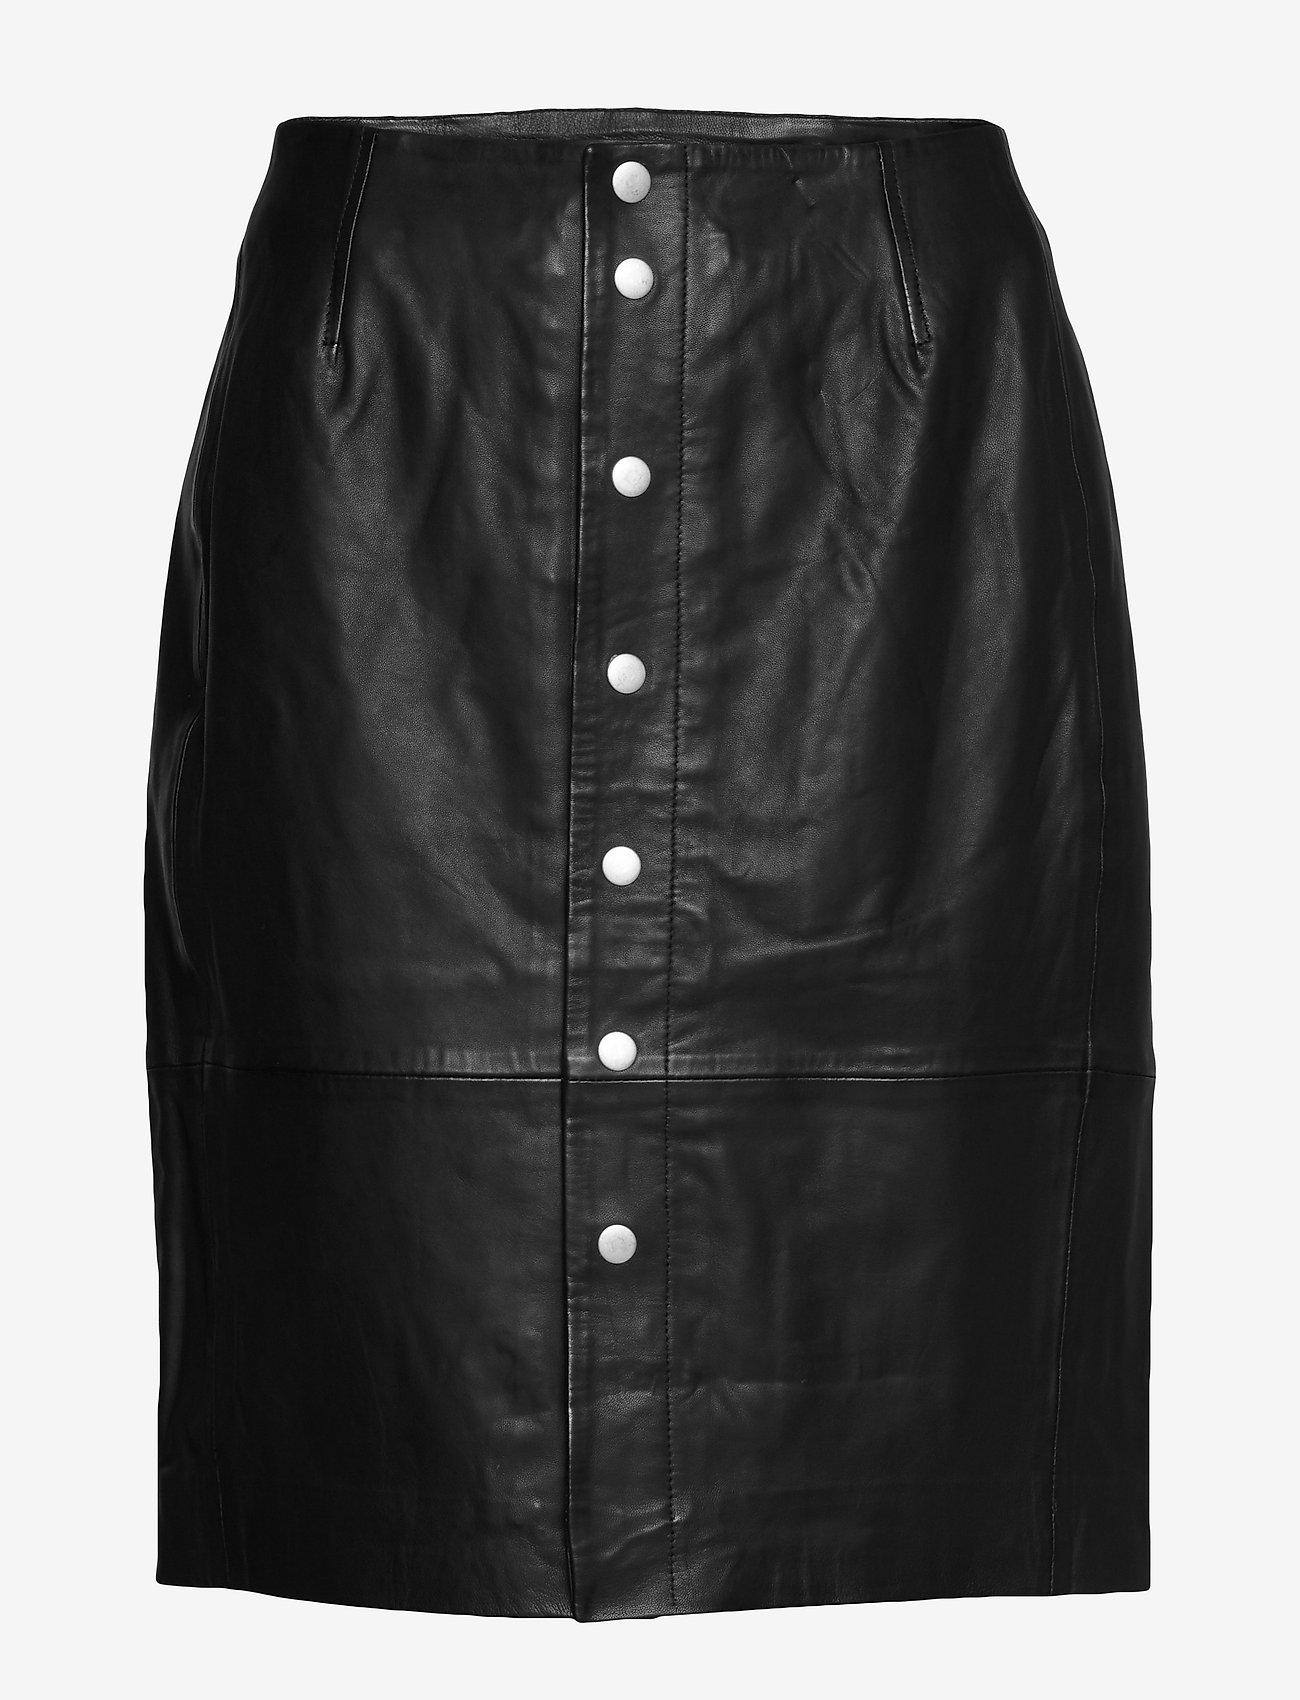 Kathiiw Skirt (Black) - InWear bmmwKa